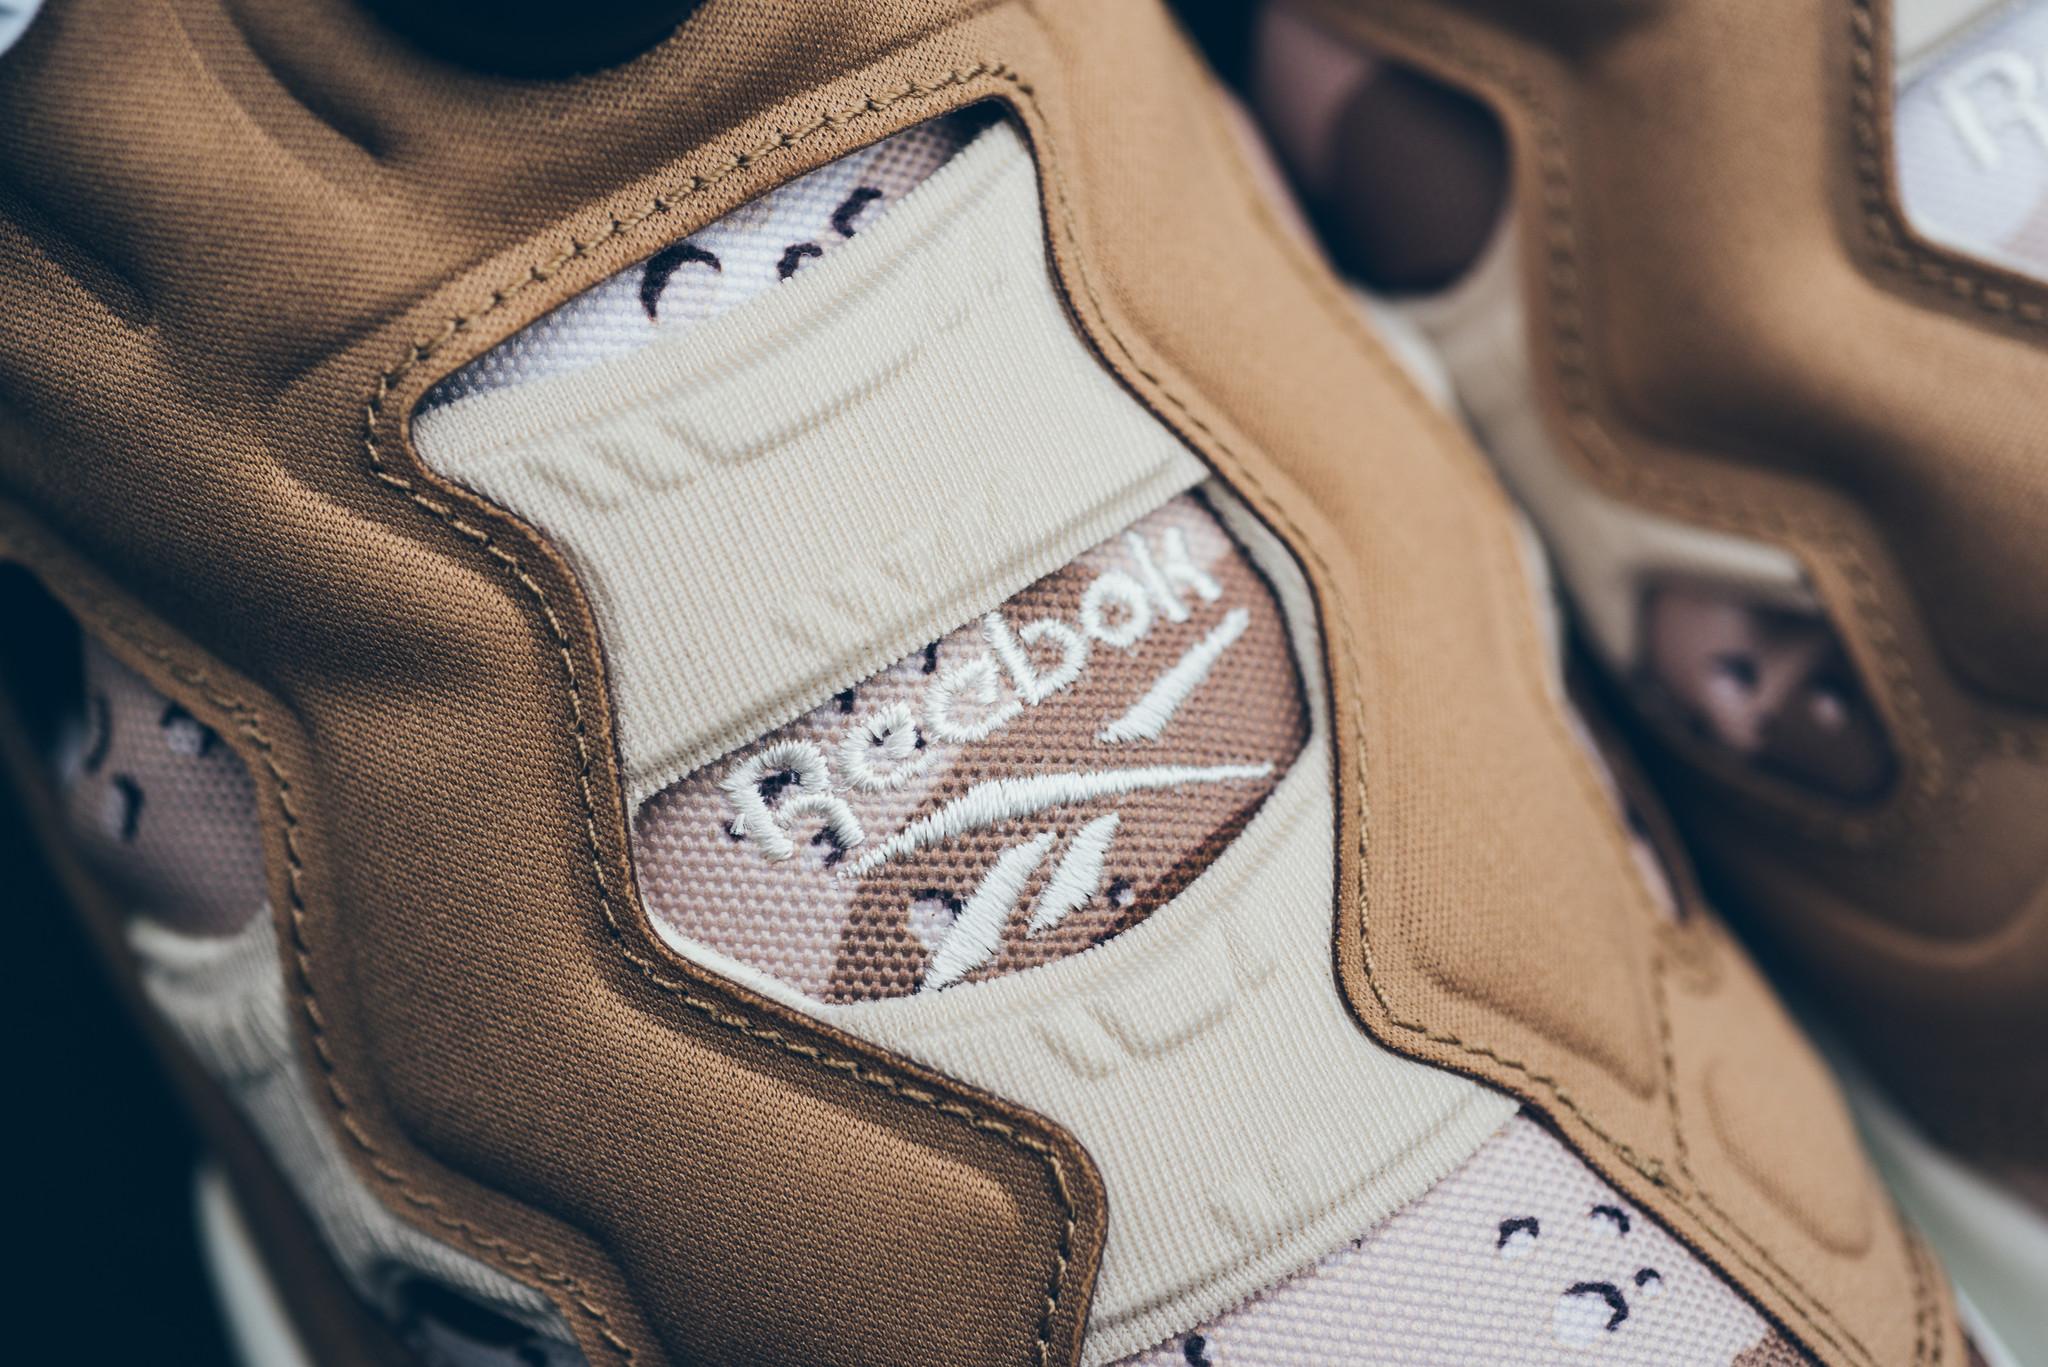 Instapump_Fury_OG_Camo_Sneaker_POlitics_Hypebeast_15